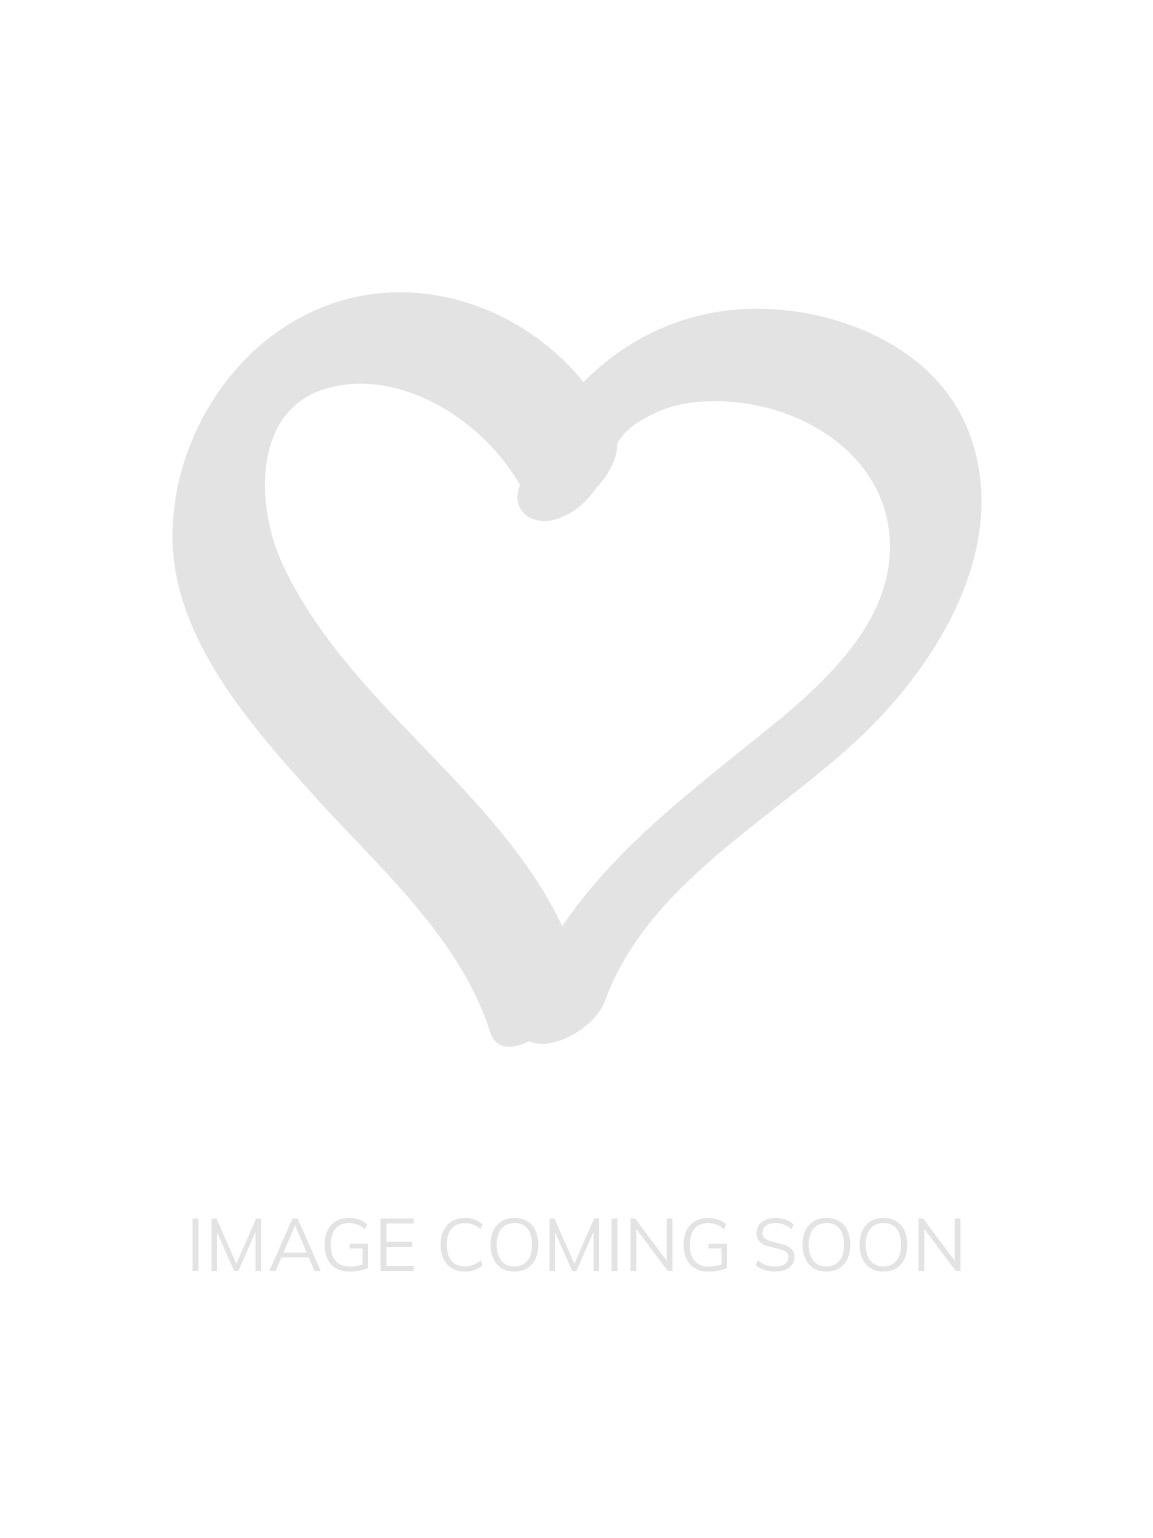 b3928a819a Beauty Minimiser Bra - Powder Pink Ivory